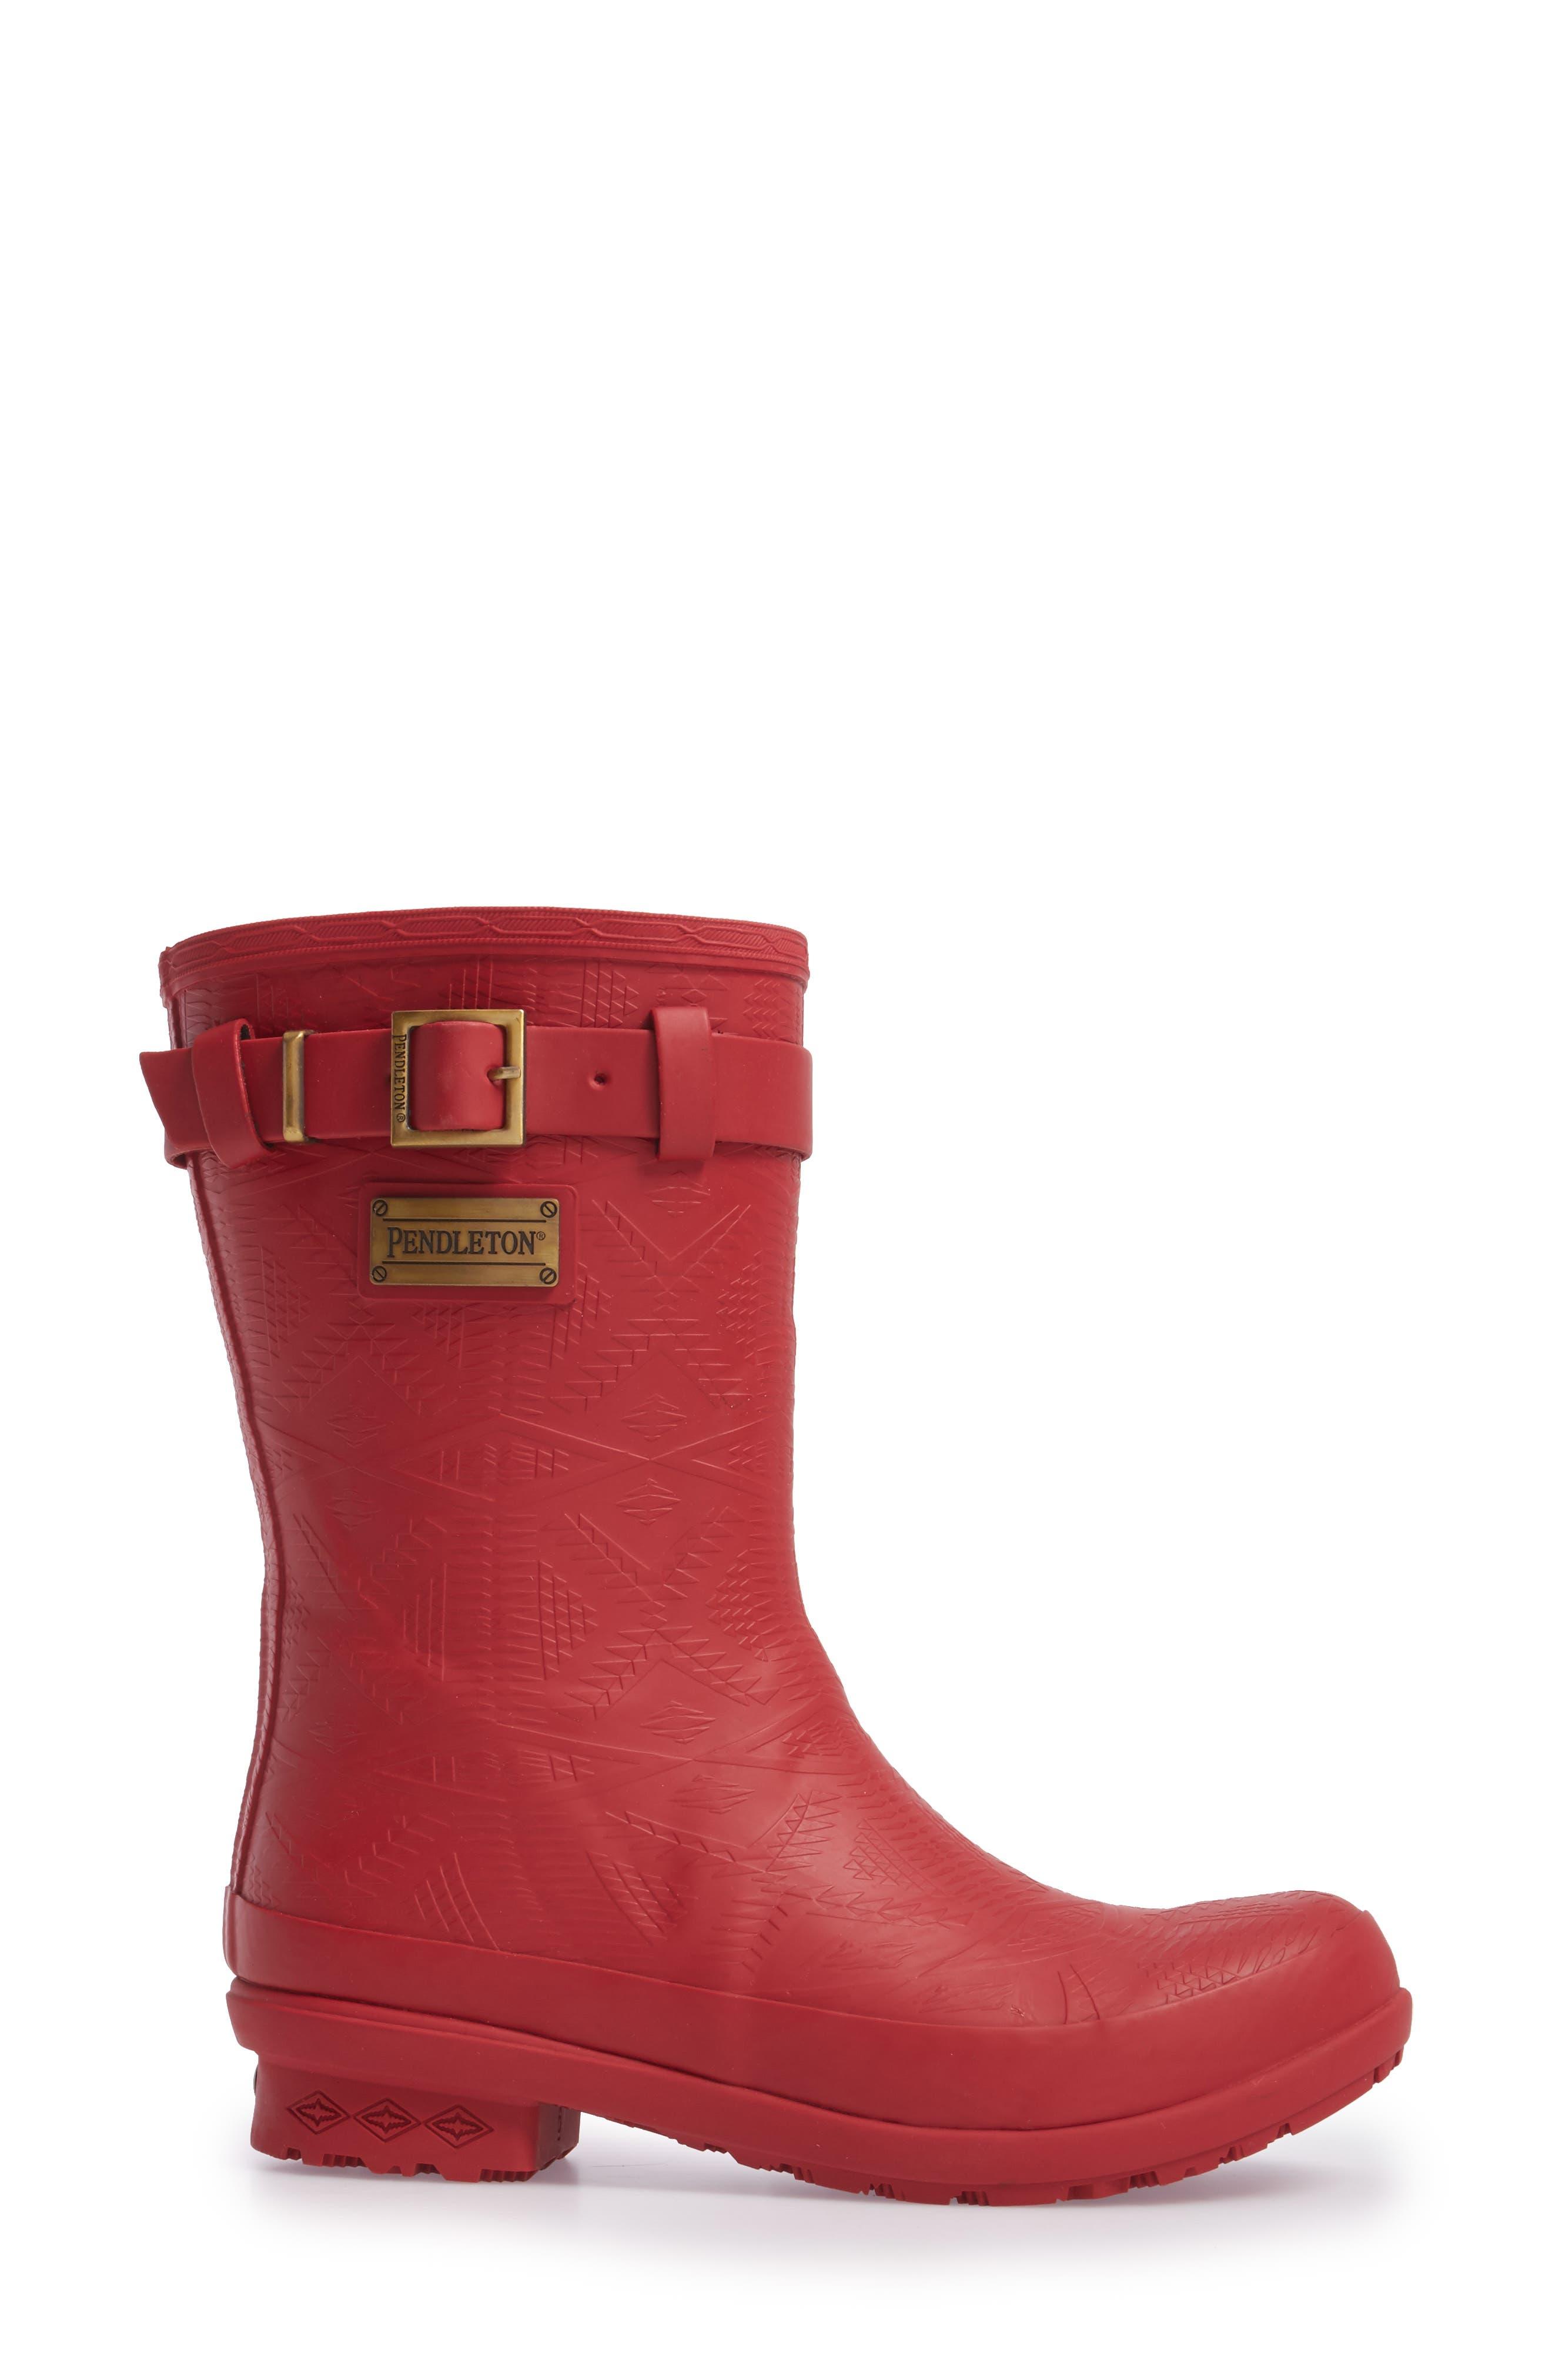 PENDLETON, Embossed Short Waterproof Rain Boot, Alternate thumbnail 3, color, SCARLET